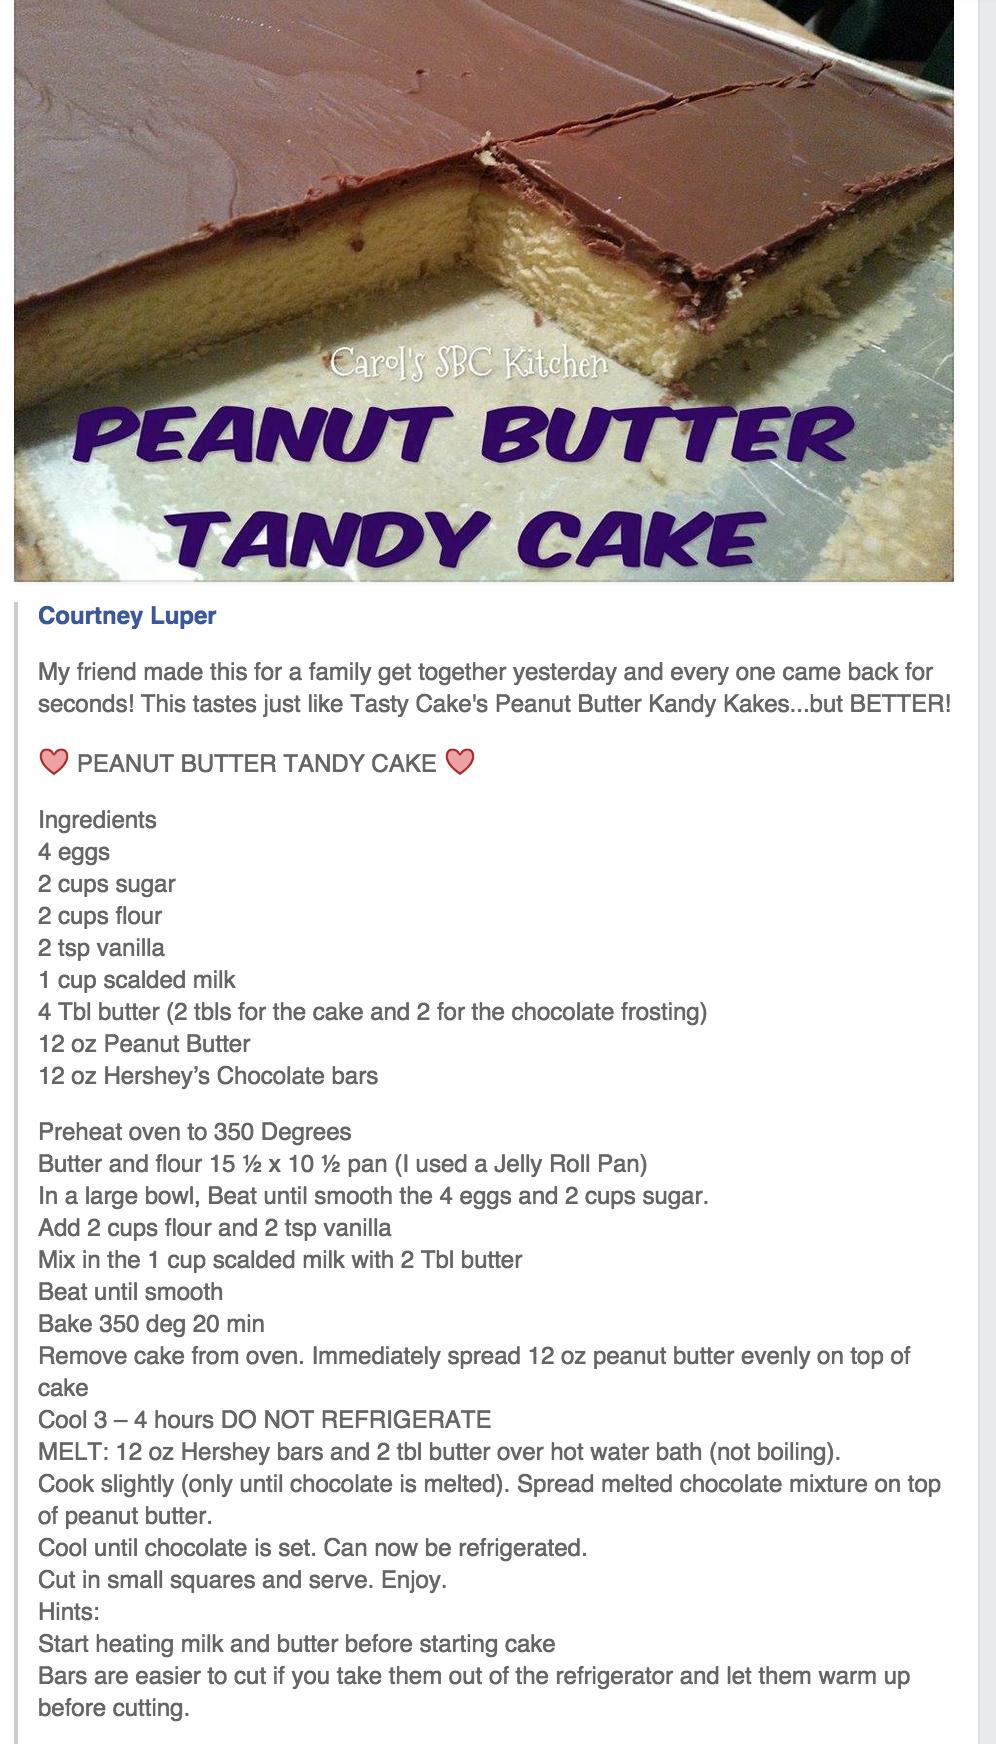 Peanut Butter Tandy Cake | Food | Pinterest | Tandy cake, Peanut ...